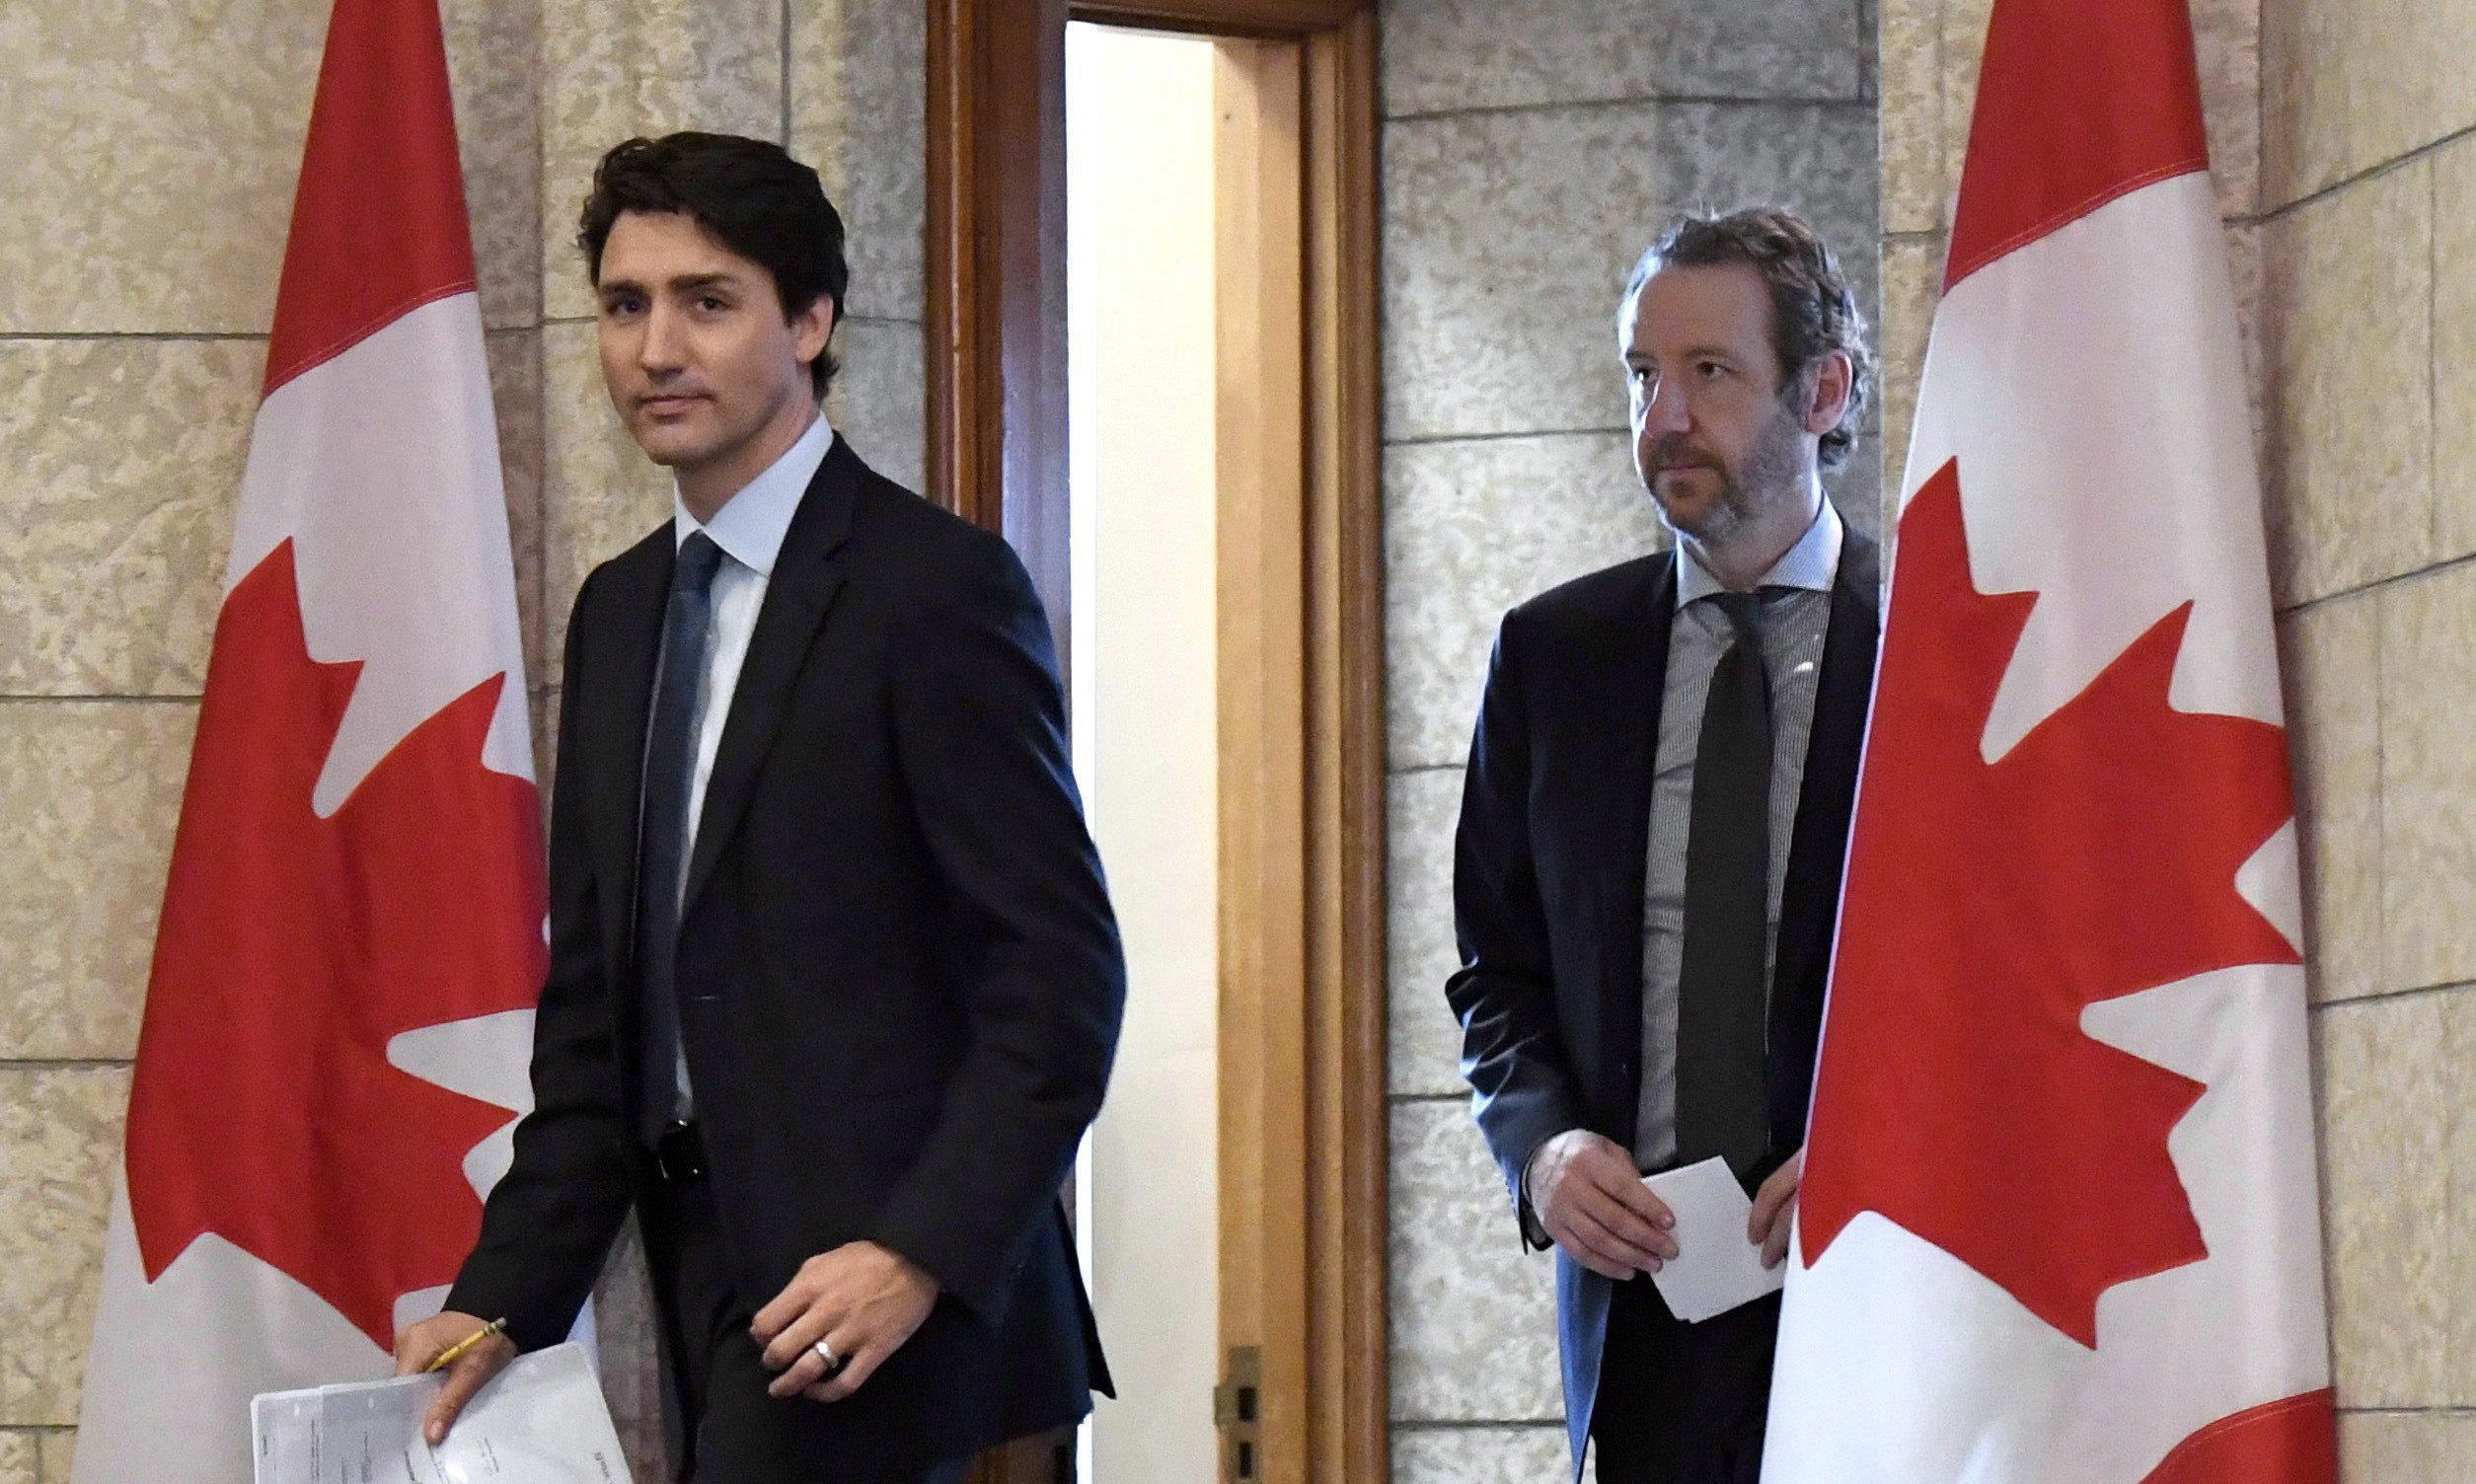 Justin Trudeau's top adviser resigns as 'political meddling' scandal widens